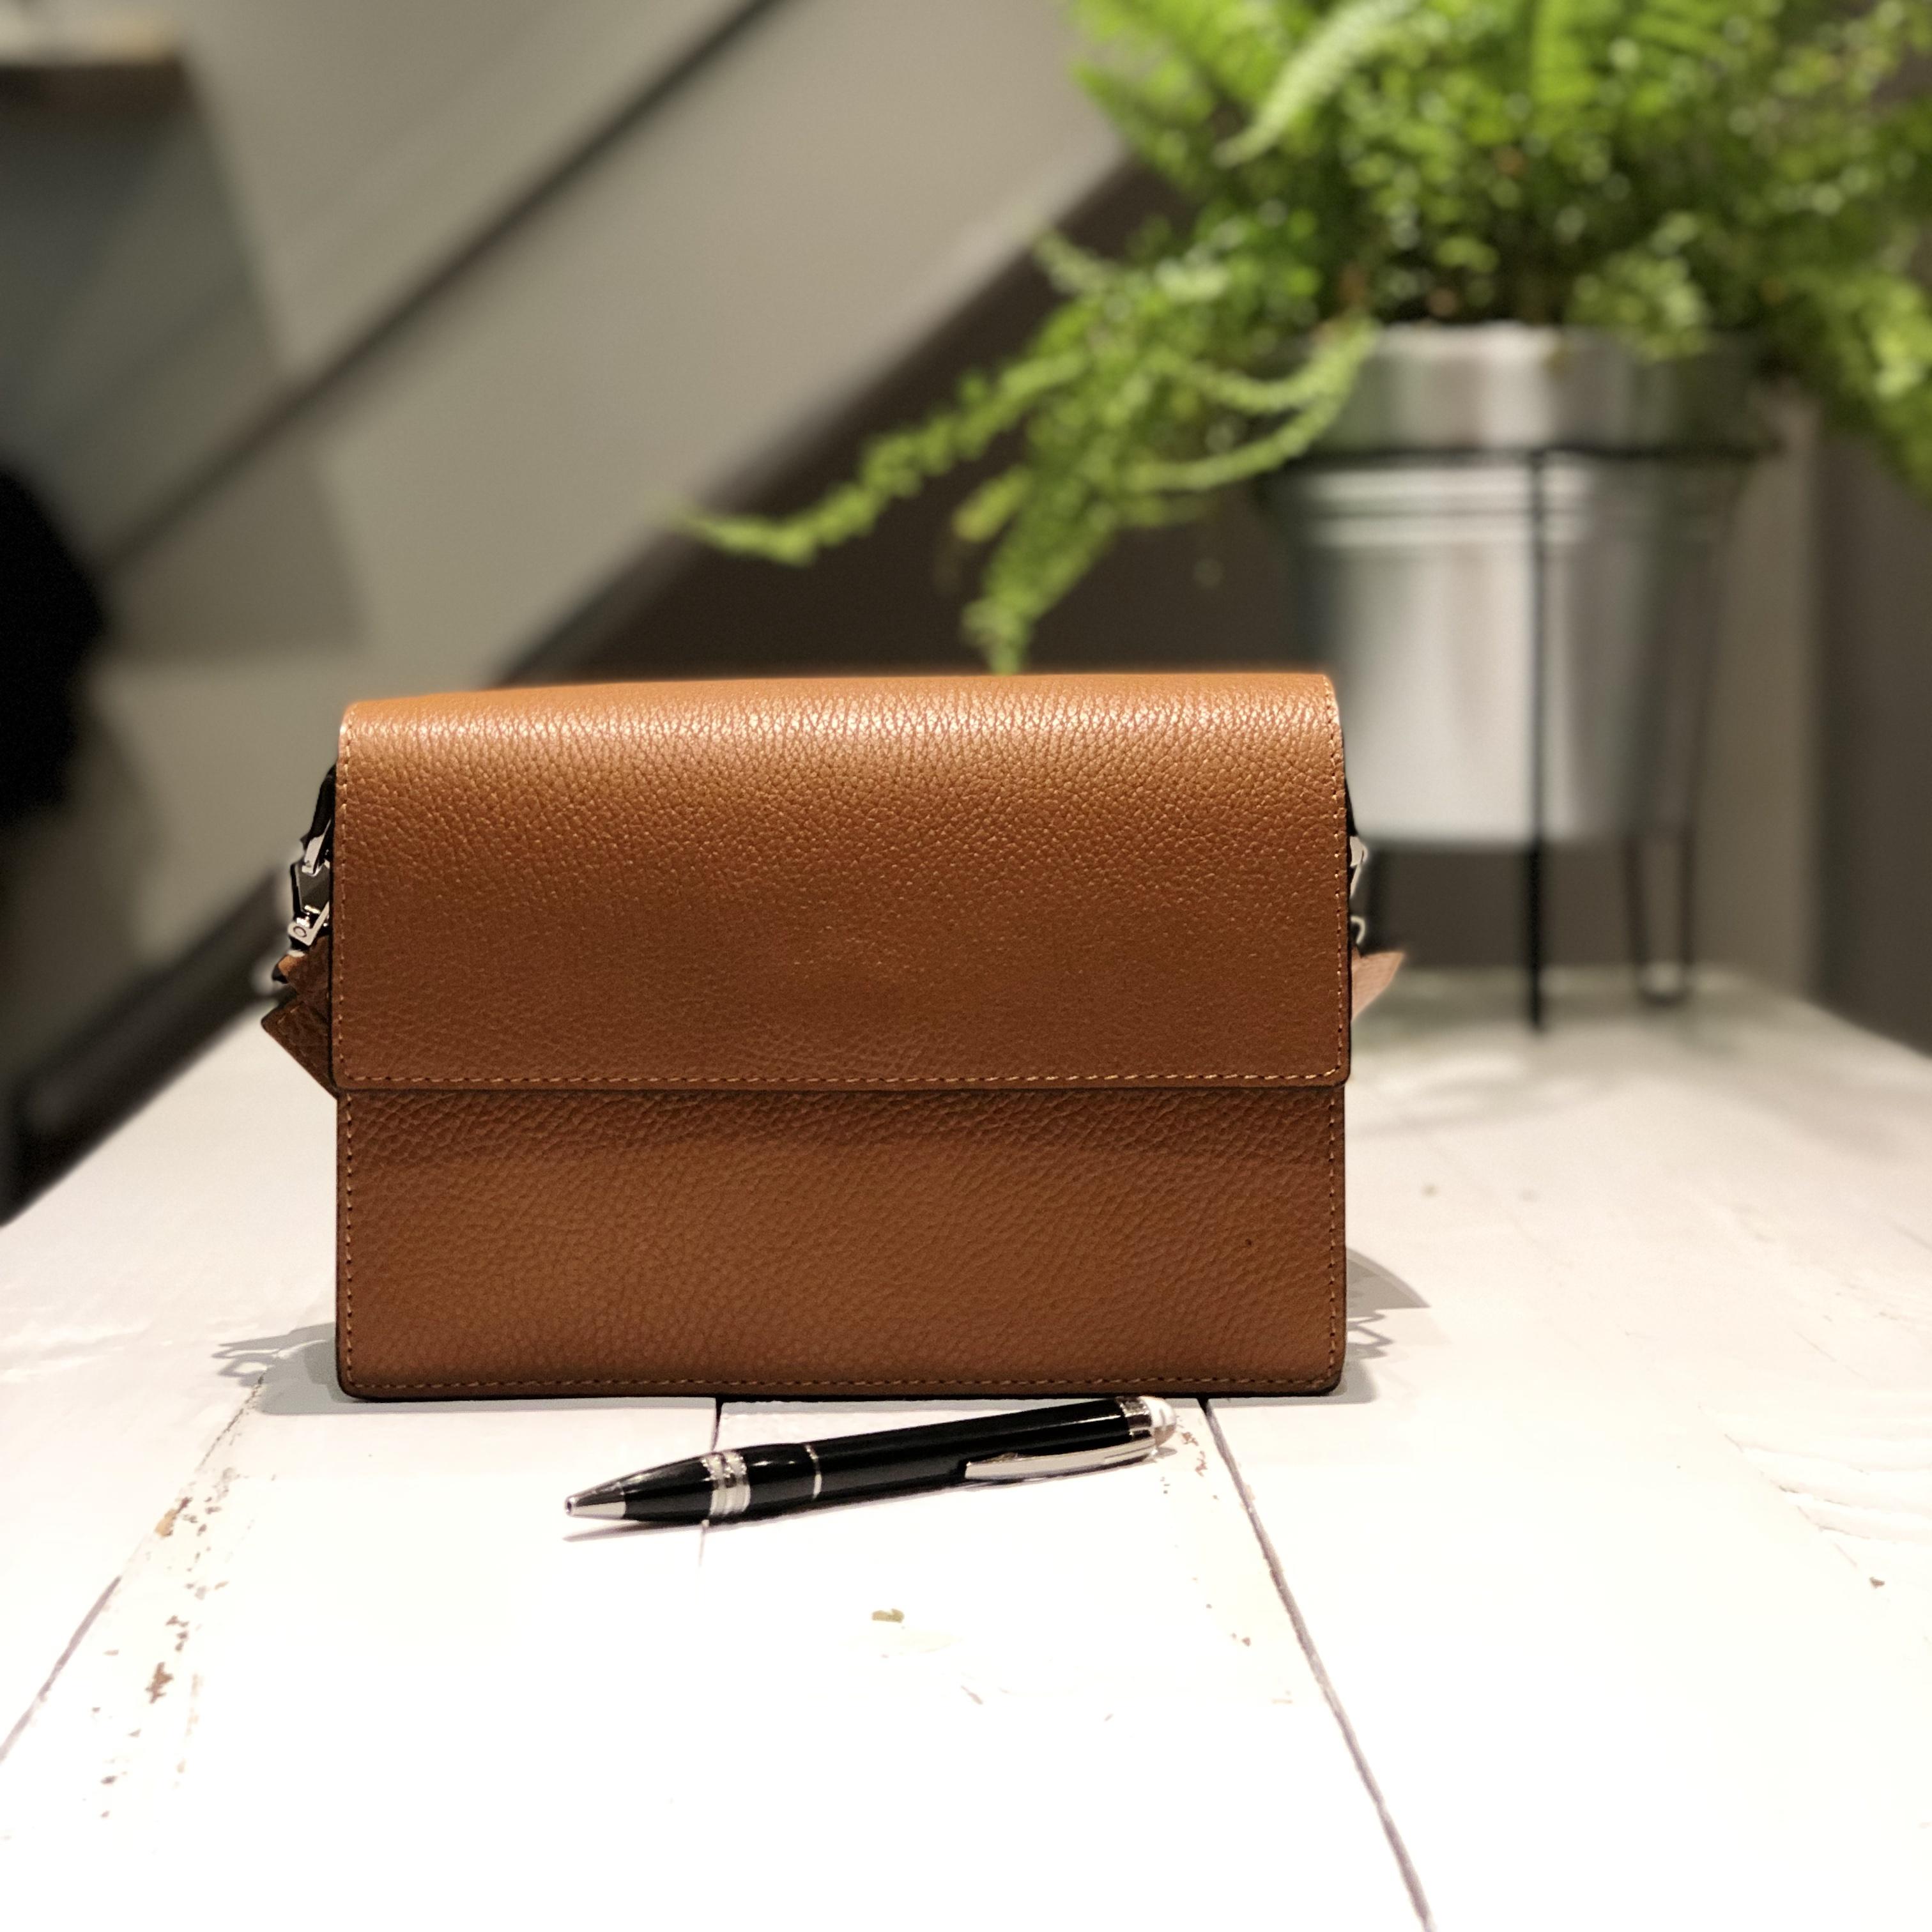 Iris Leather Bag - Camel